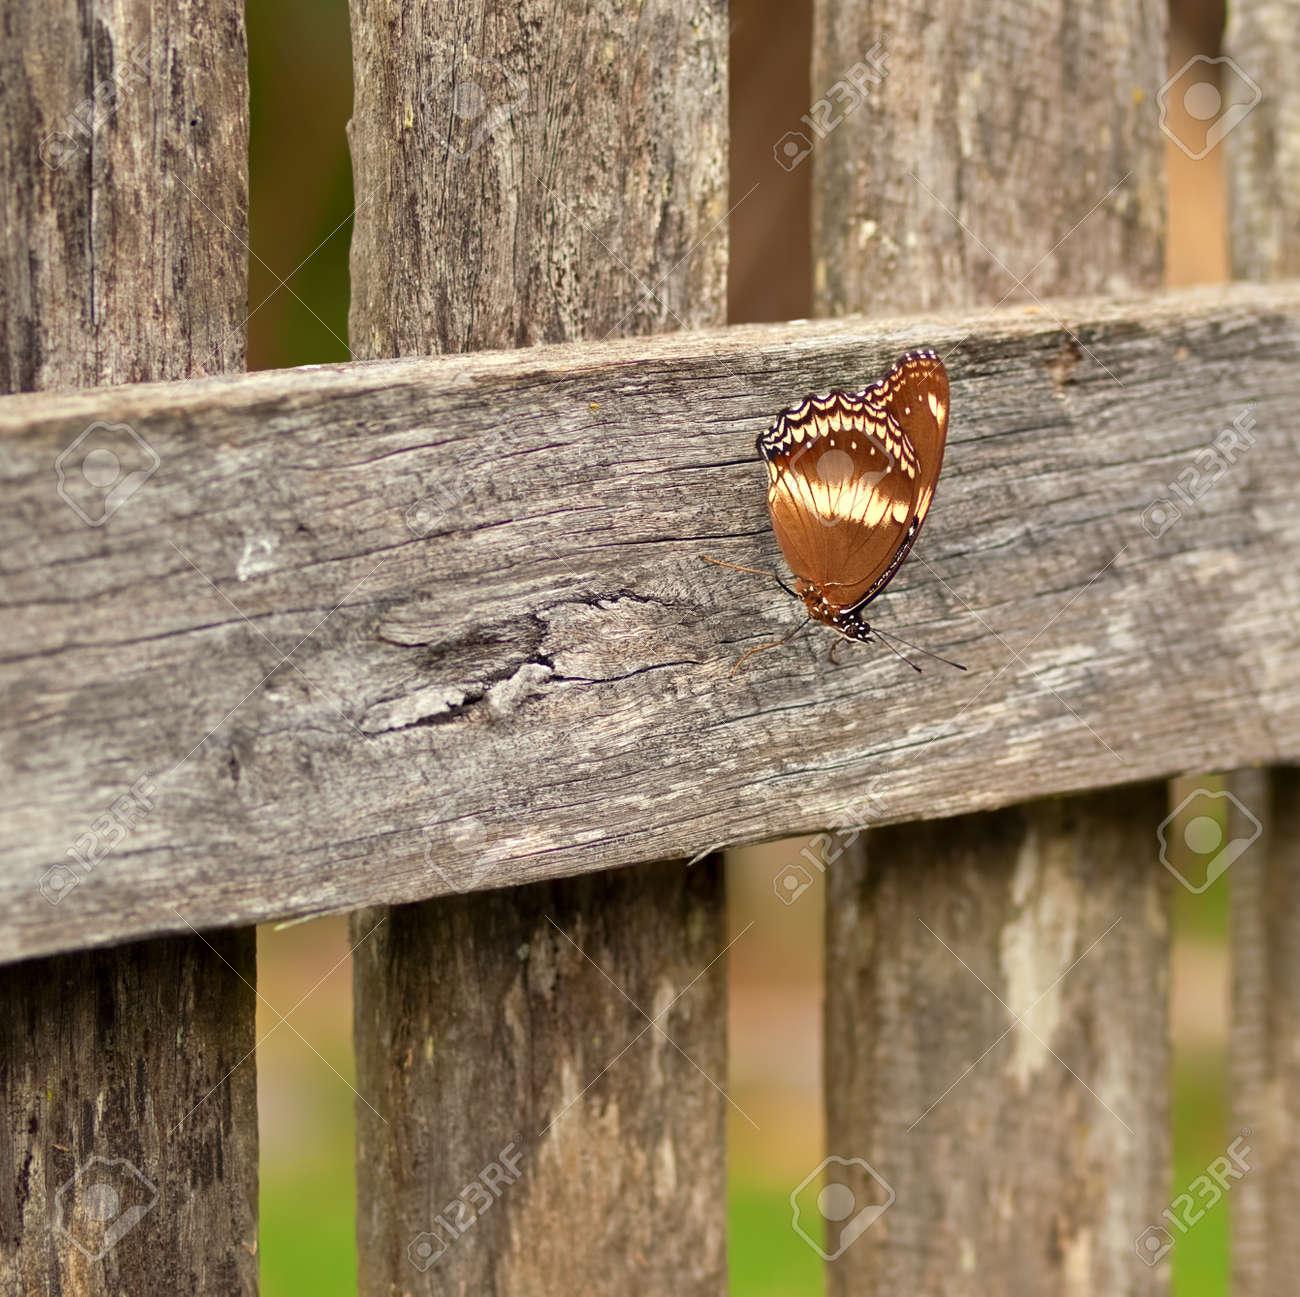 Autumn Day Australian Schmetterling Ruht Auf Altem Holz Lattenzaun